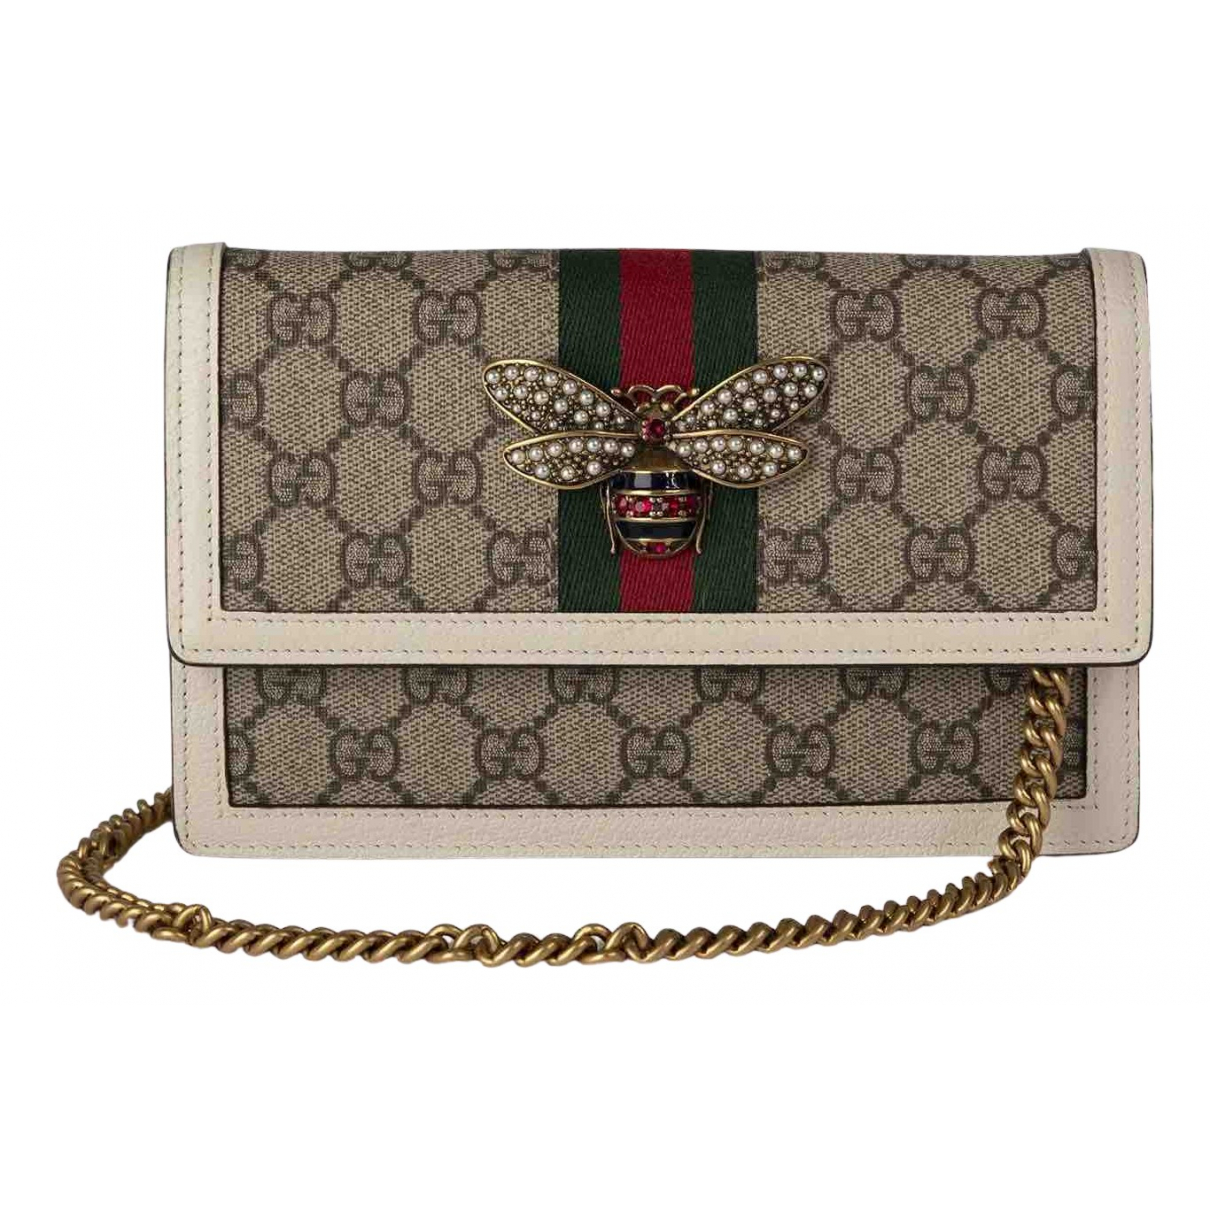 Gucci Queen Margaret Handtasche in  Beige Leinen